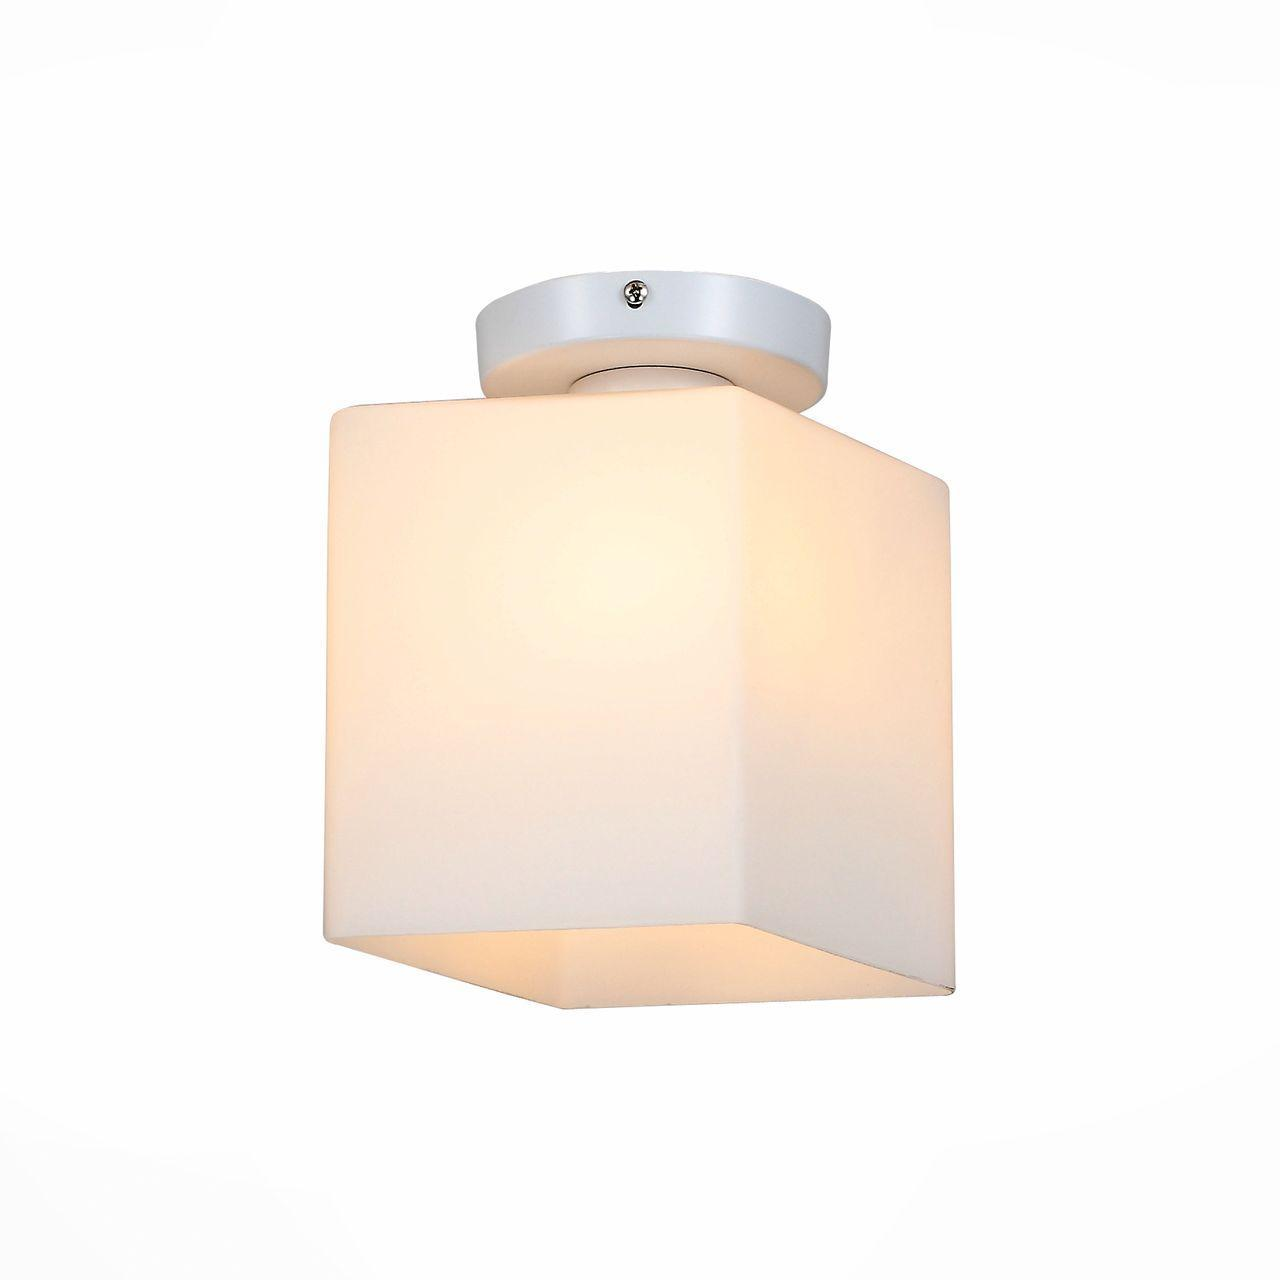 Настенно-потолочный светильник ST Luce Aspetto SL548.501.01 st luce светильник настенно потолочный st luce ovale sl546 501 01